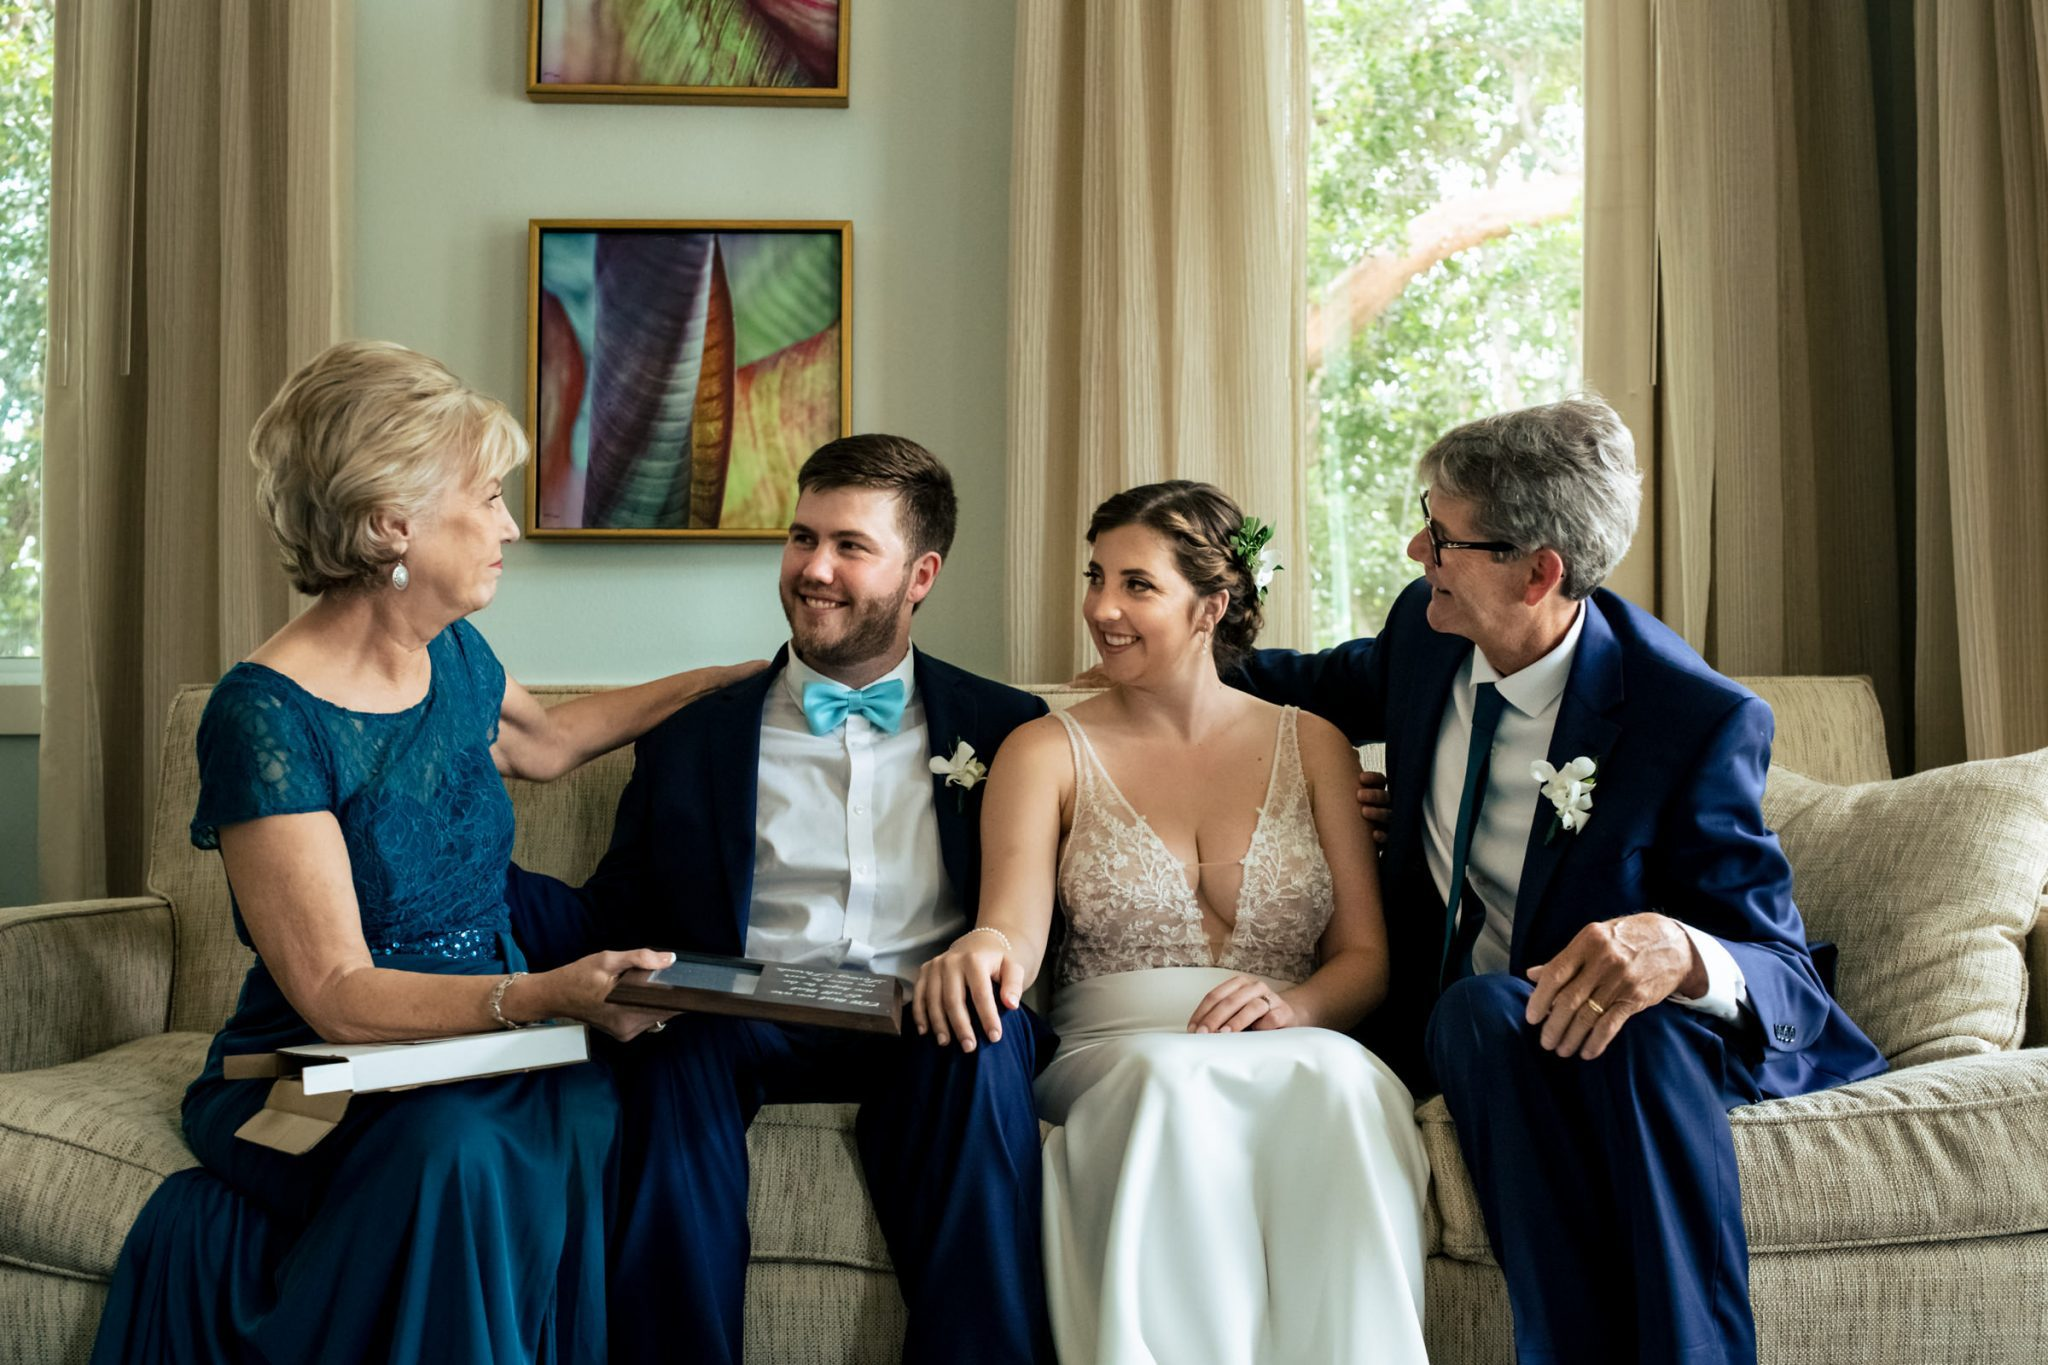 parents with bride and groom before wedding playa largo resort wedding